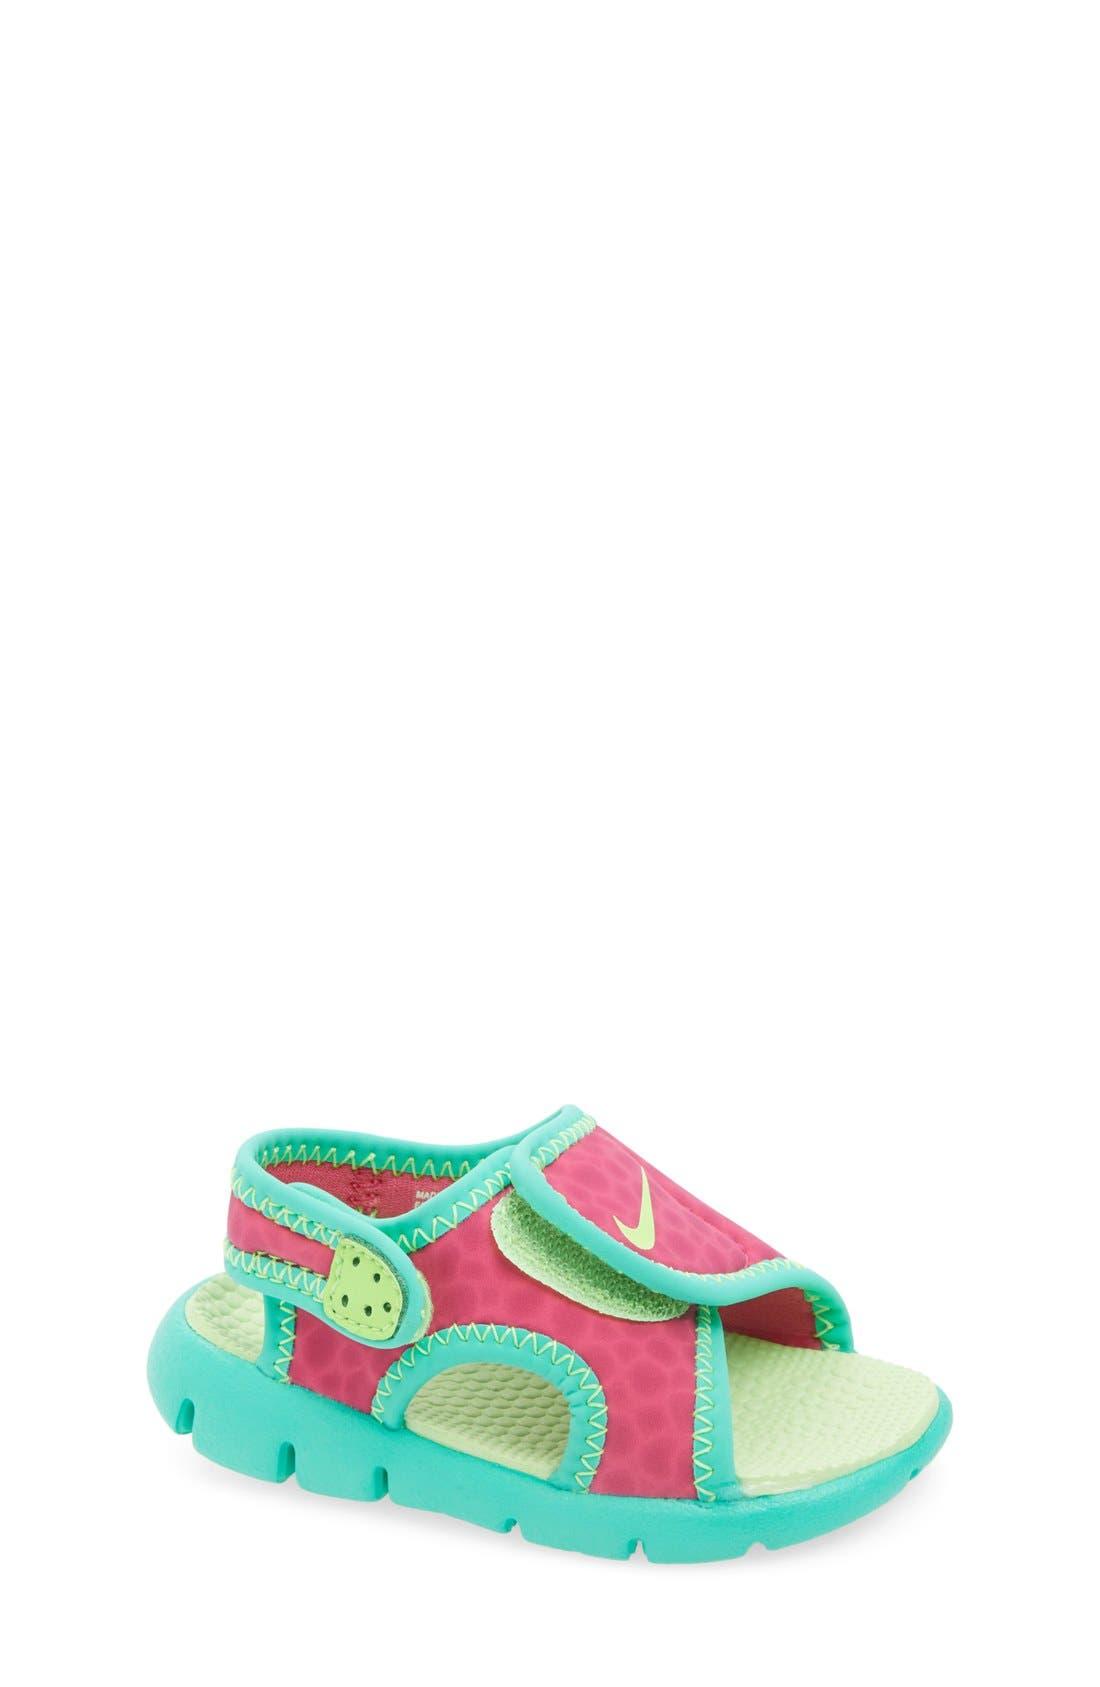 Alternate Image 1 Selected - Nike 'Sunray Adjust 4' Sandal (Baby, Walker & Toddler)